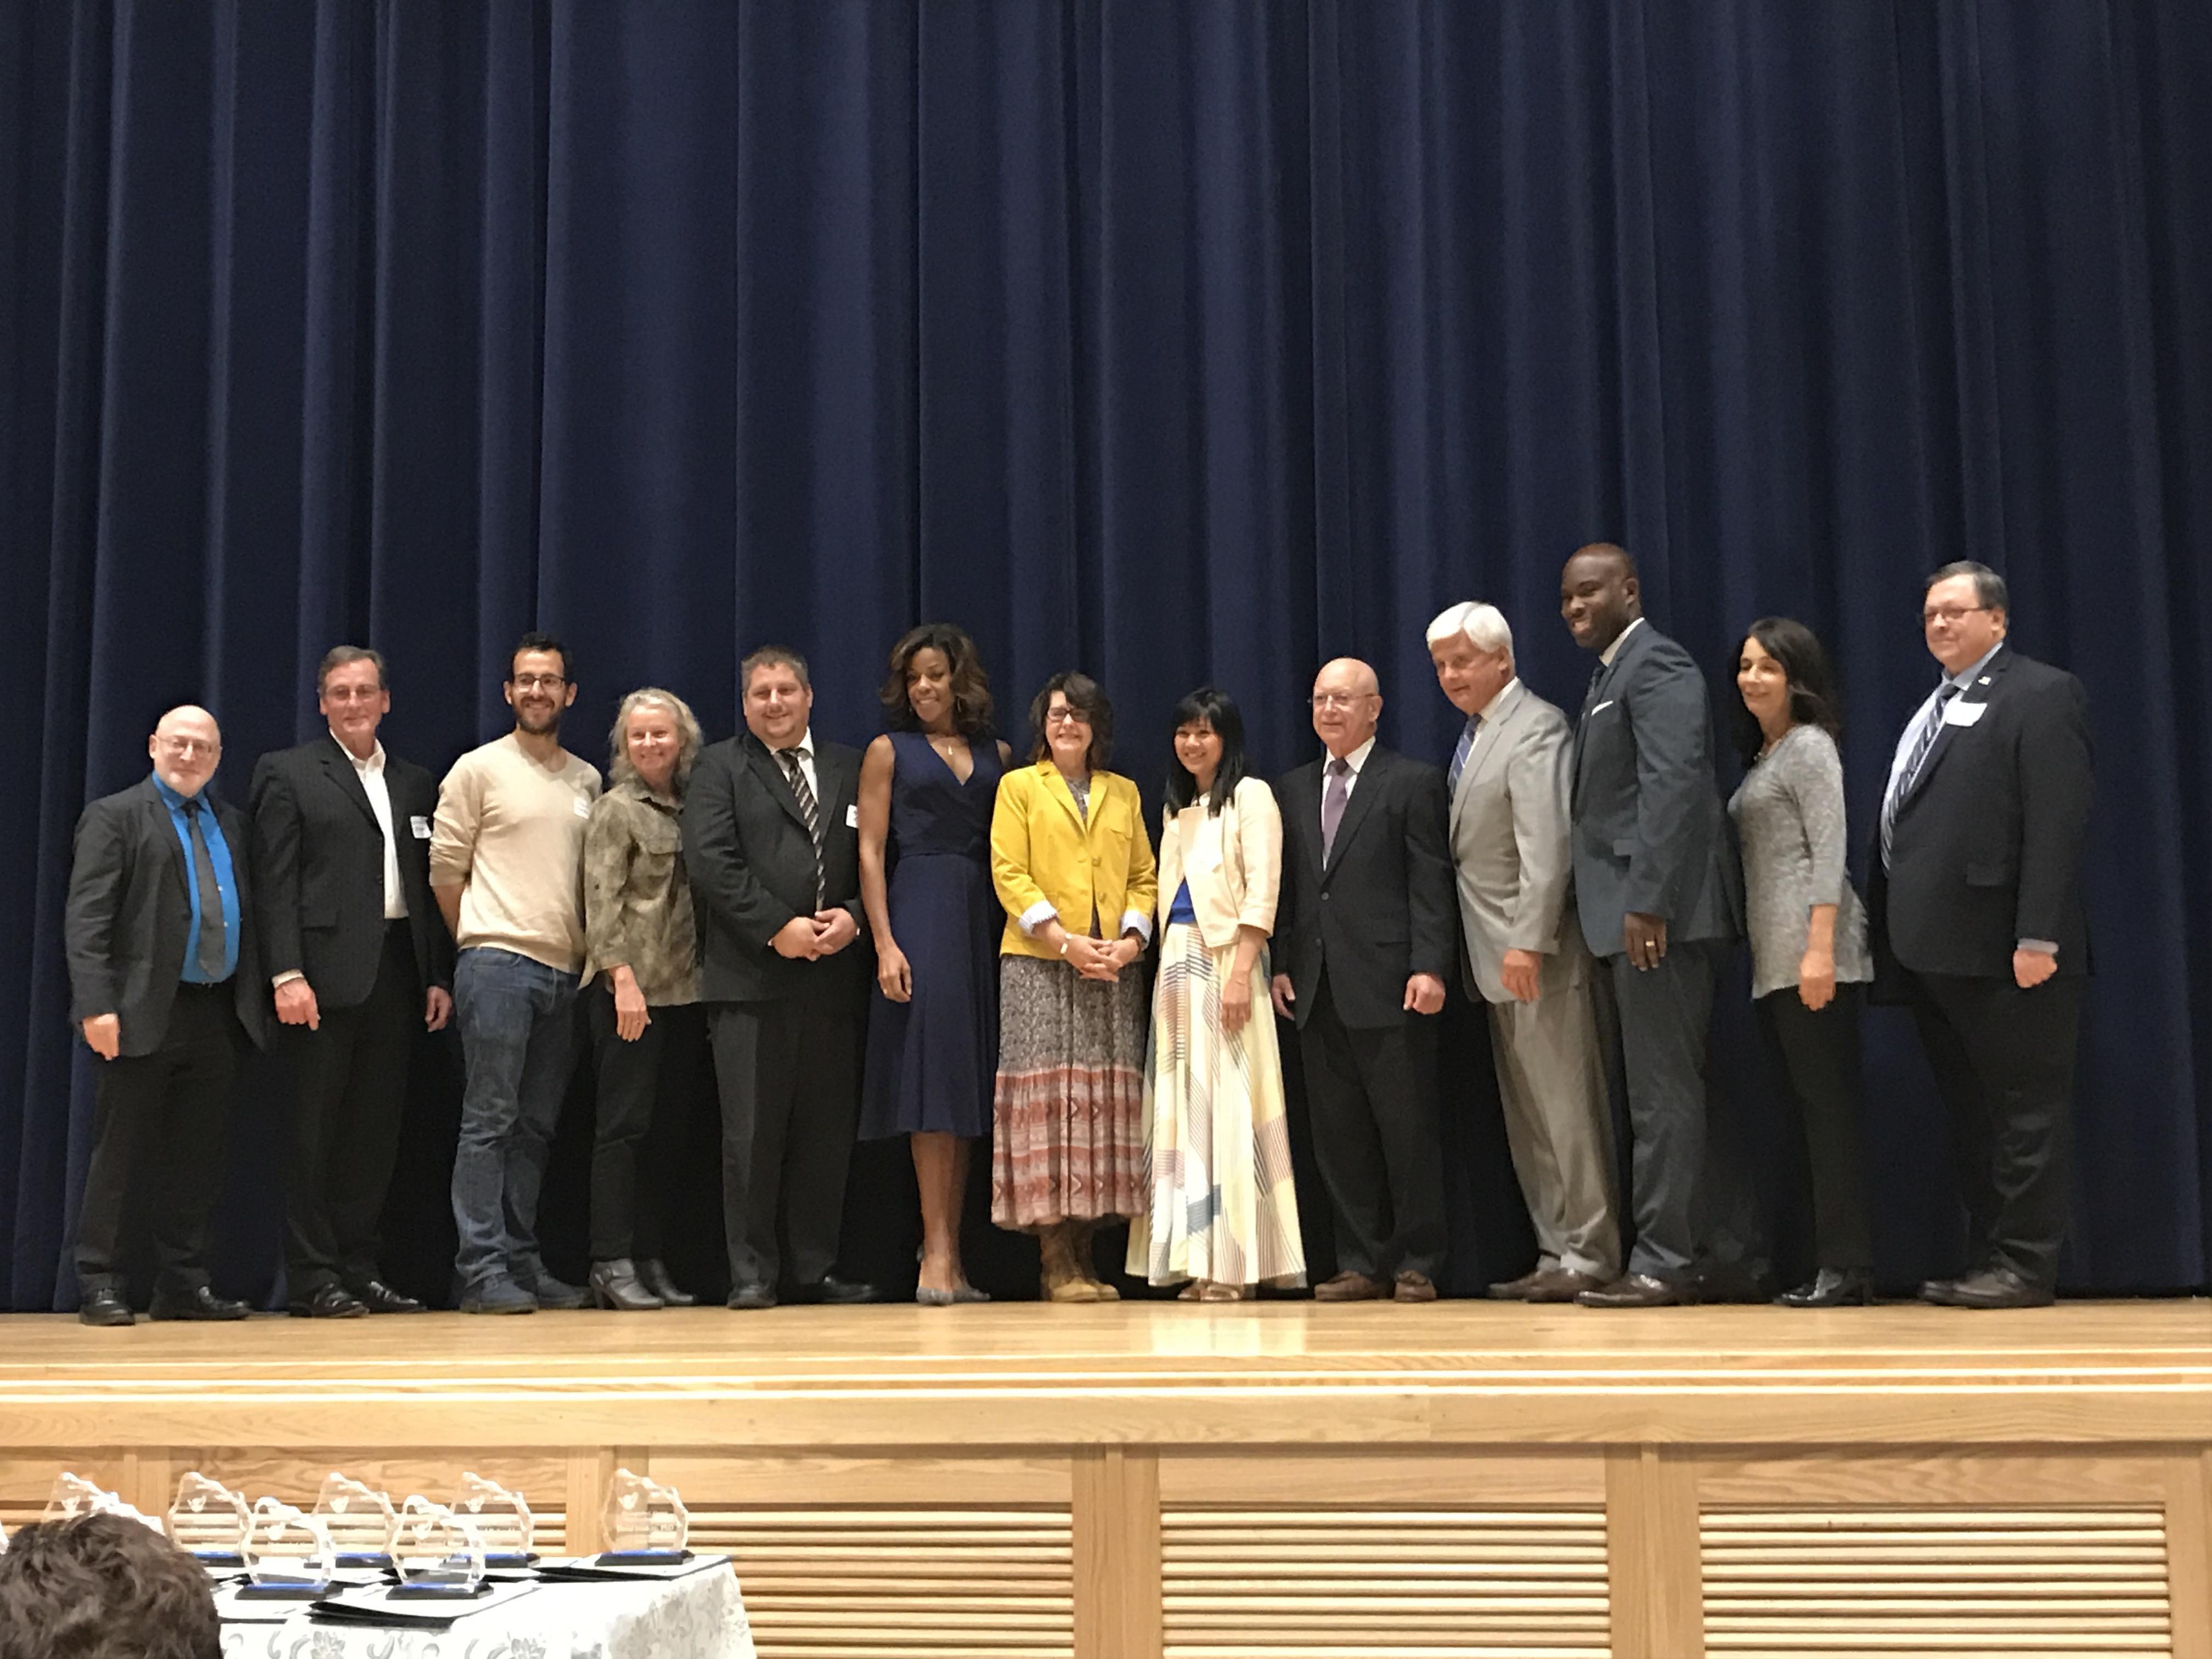 14 Bensalem High School Distinguished Alumni pose for photo during October 2017 Induction Ceremony.